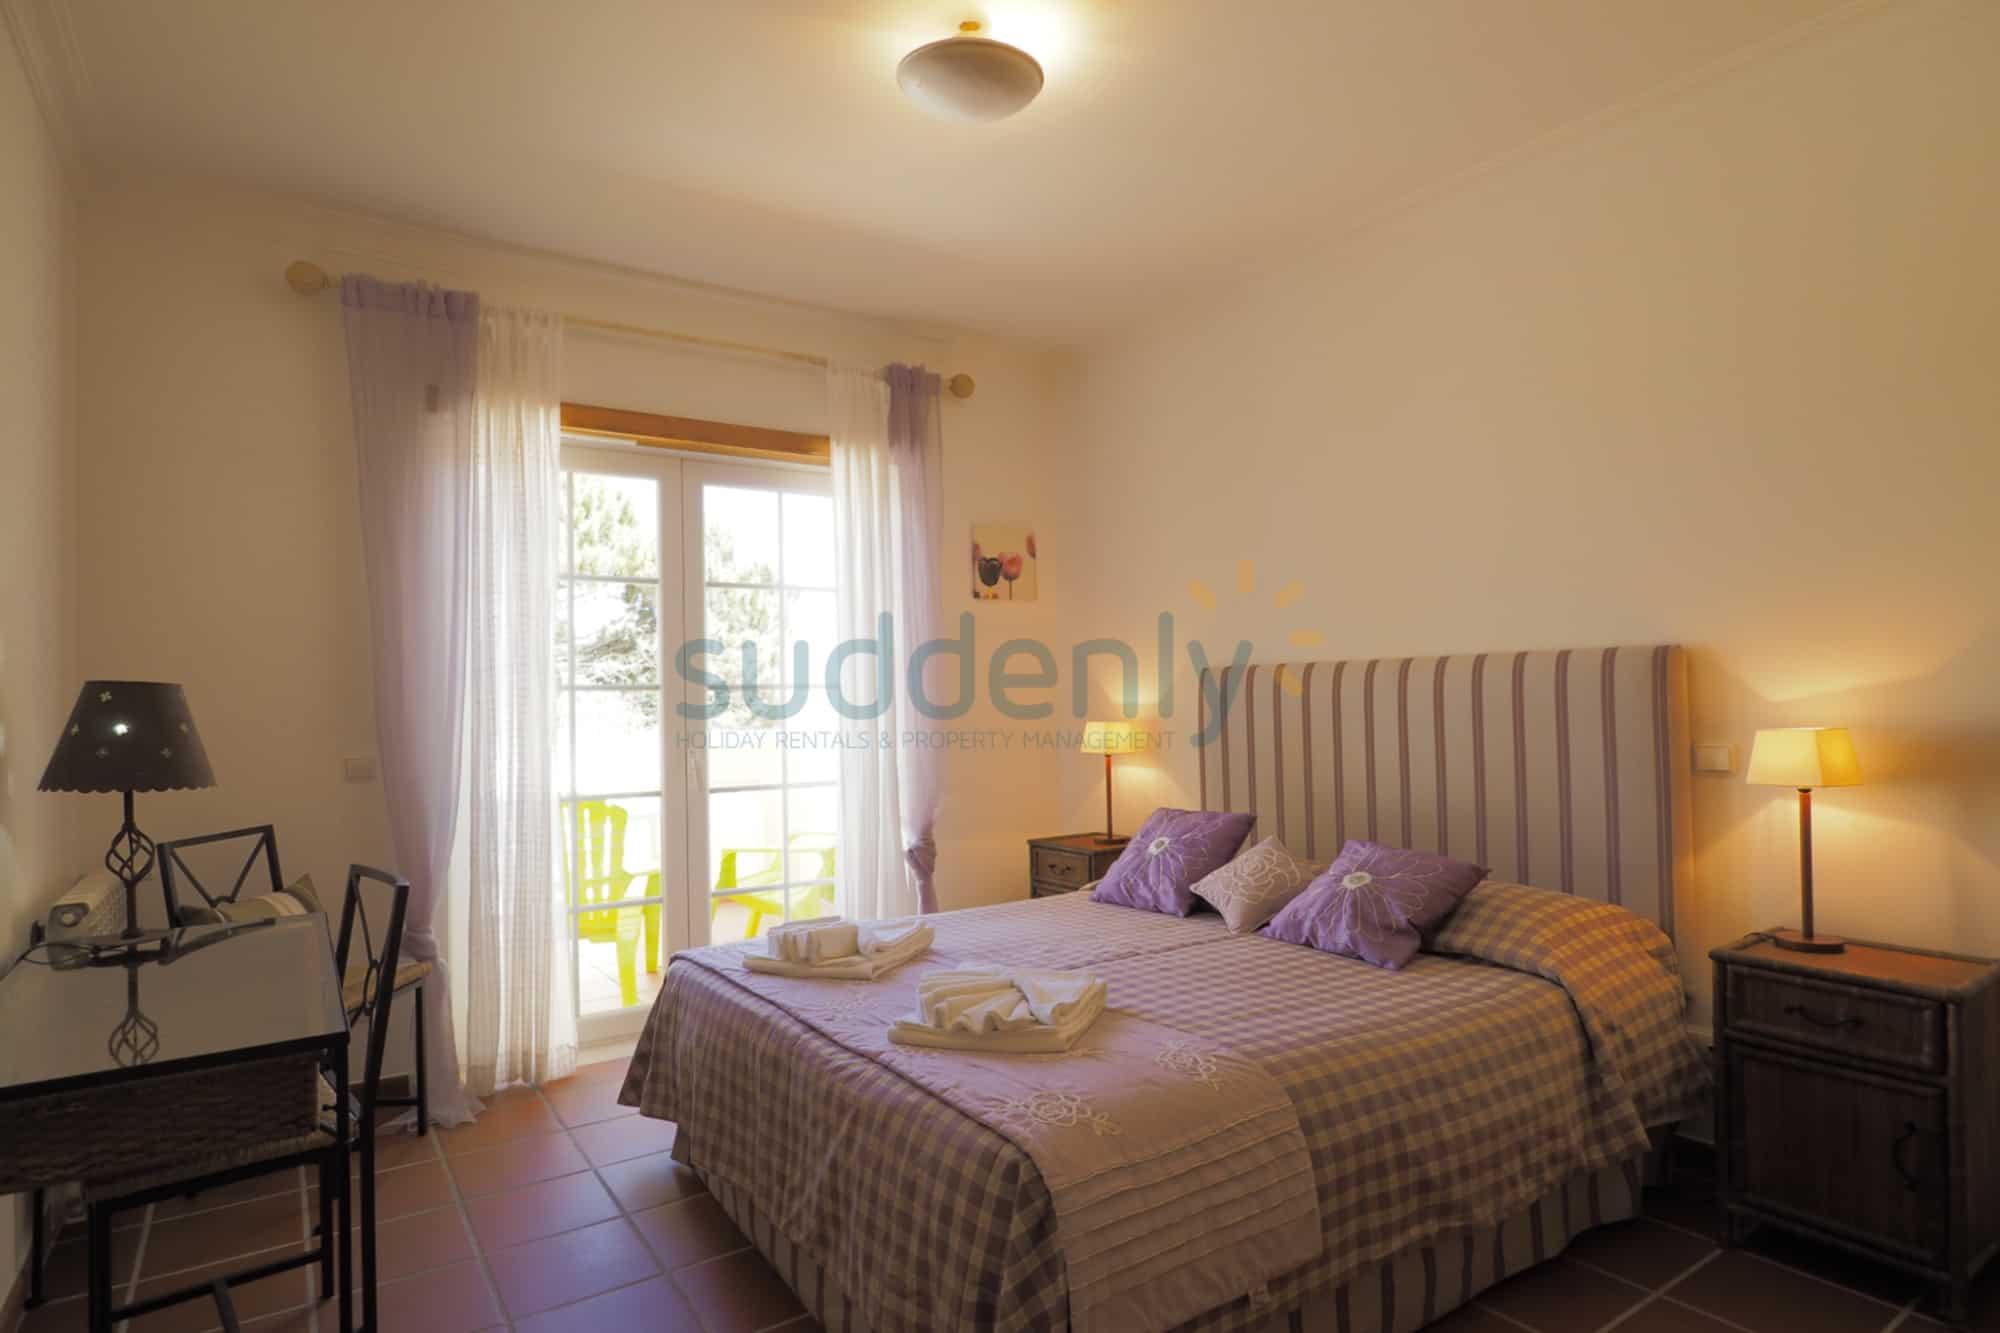 67584/AL - 15 Afonso Praia D'El Rey 15